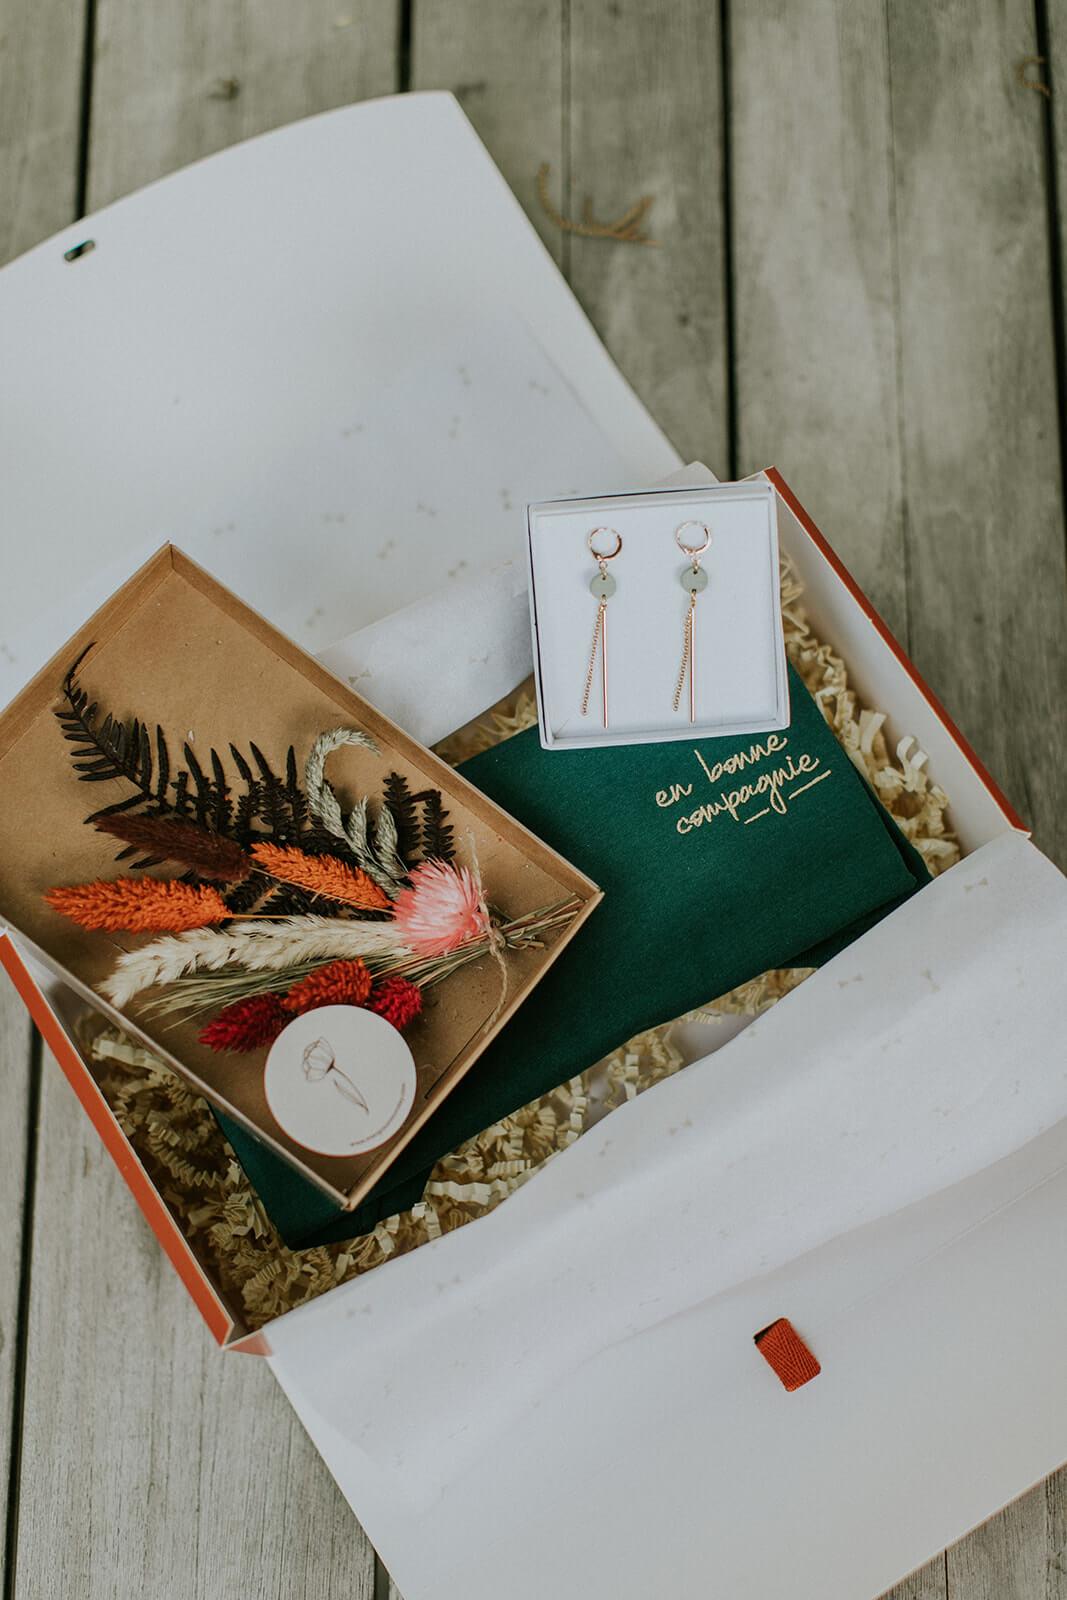 En bonne compagnie - Giftbox - Mangos on Monday